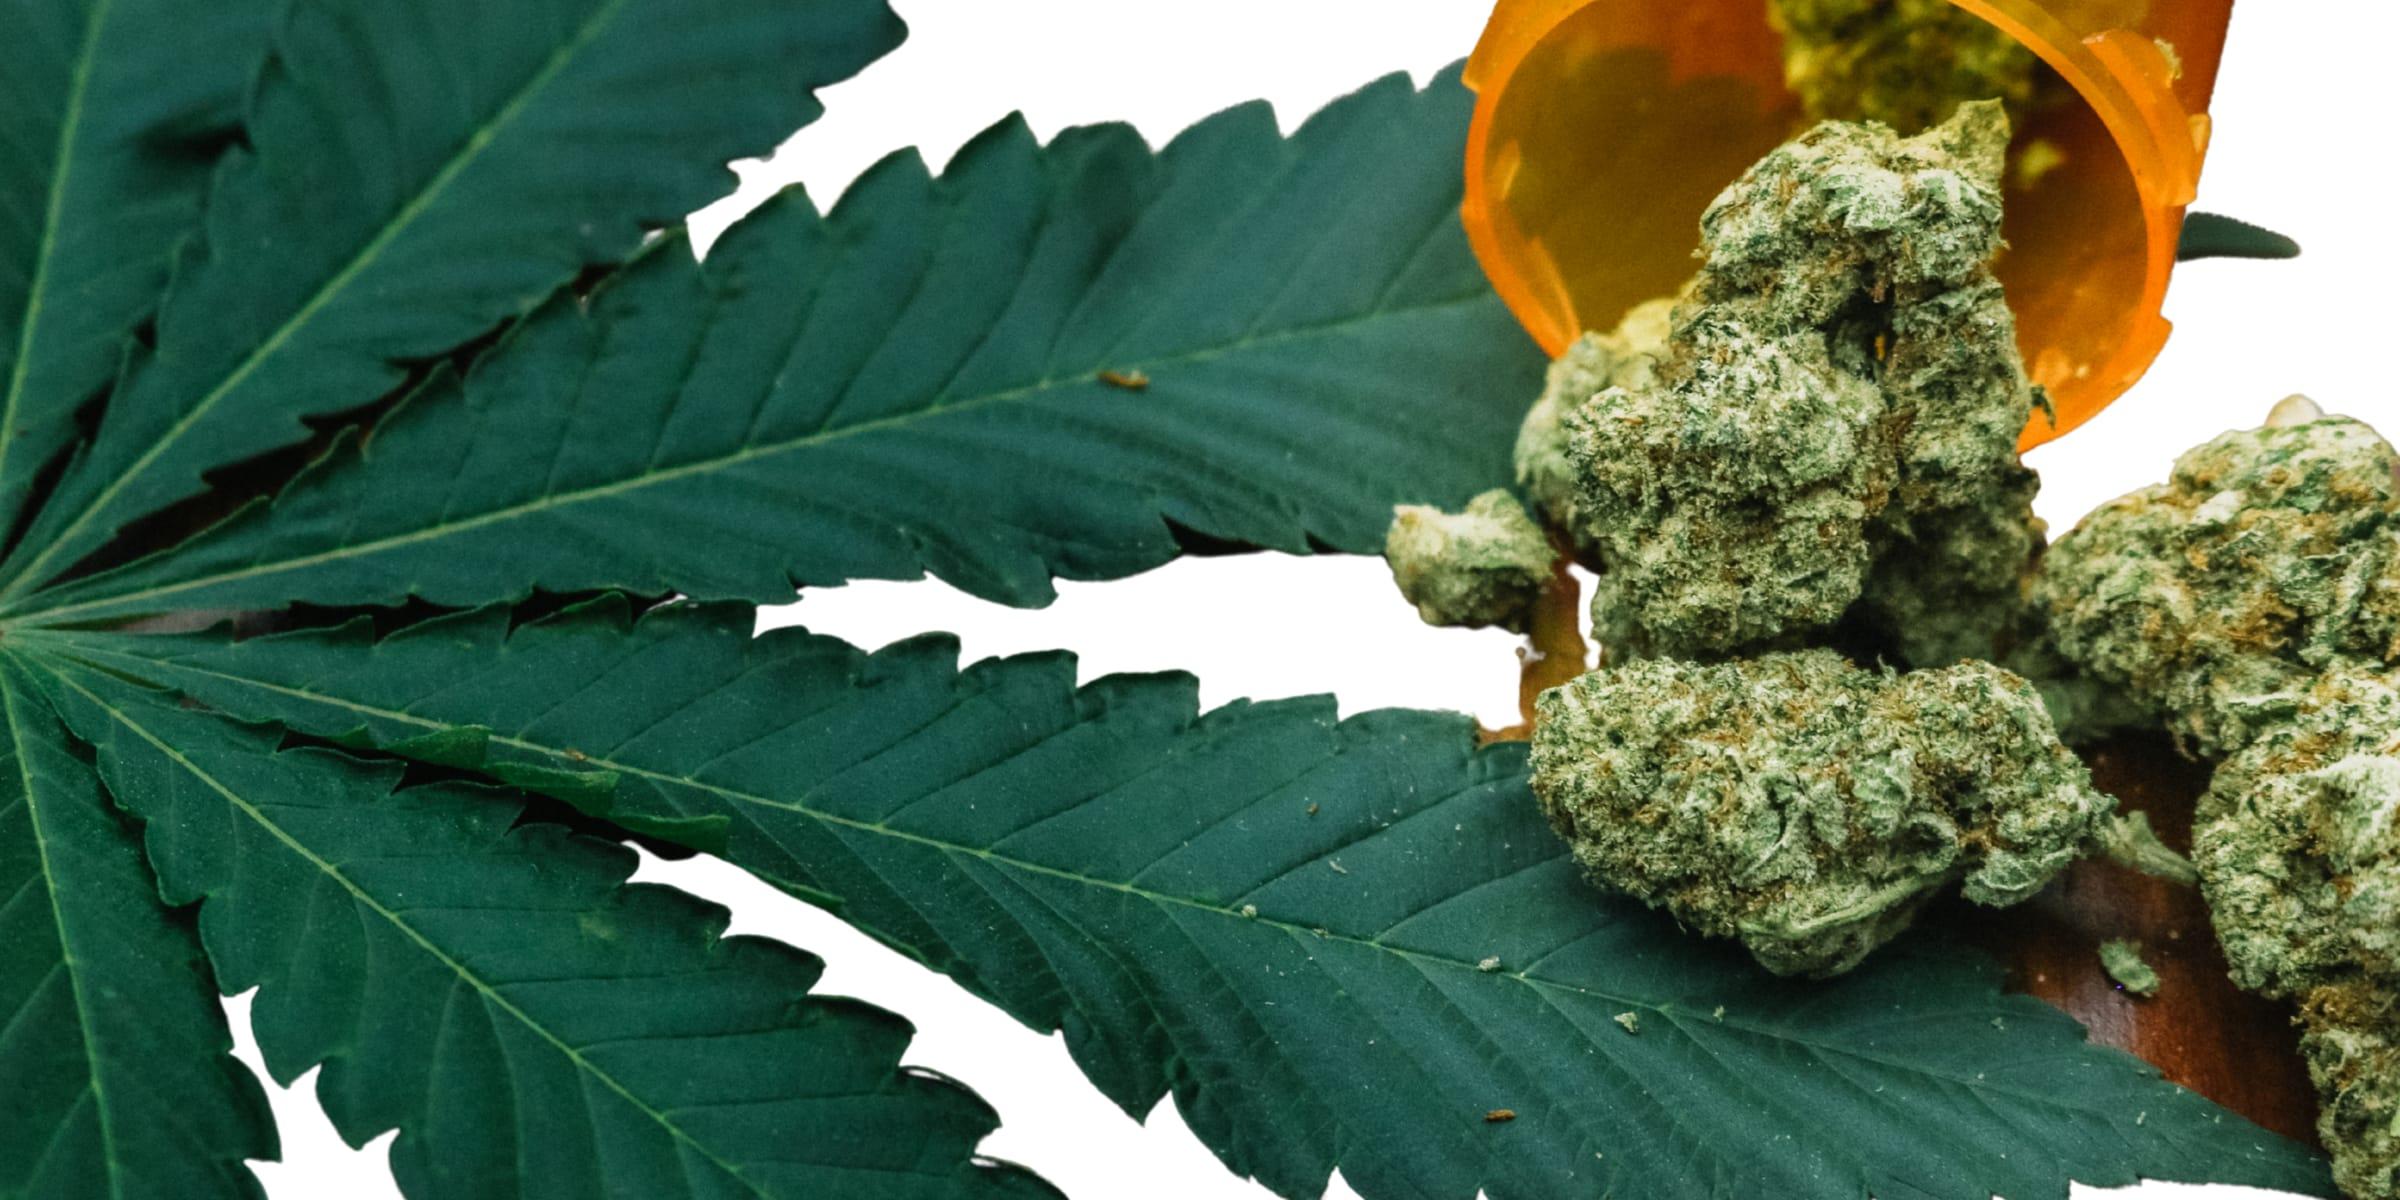 How to use Marijuana to relieve pain